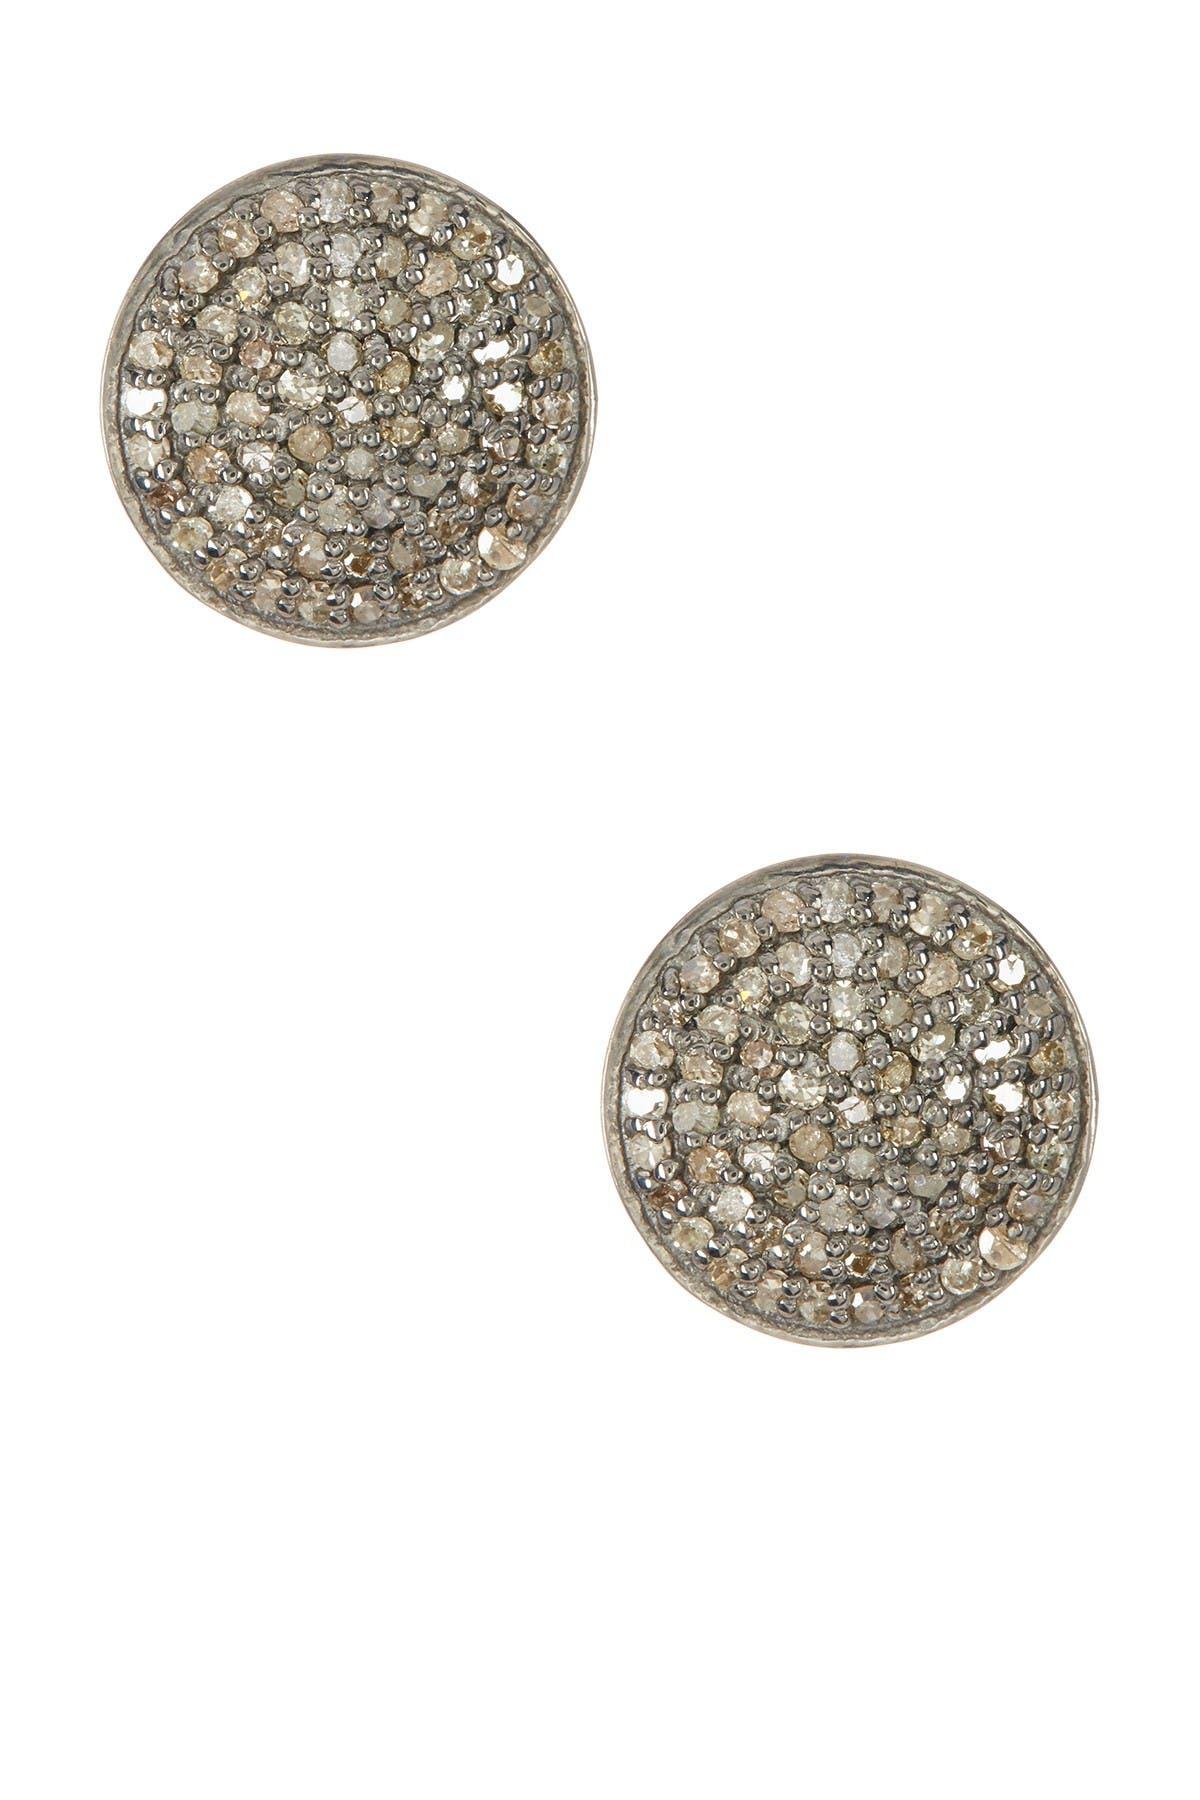 Image of ADORNIA Imogen Champagne Diamond Earrings - 1.00 ctw